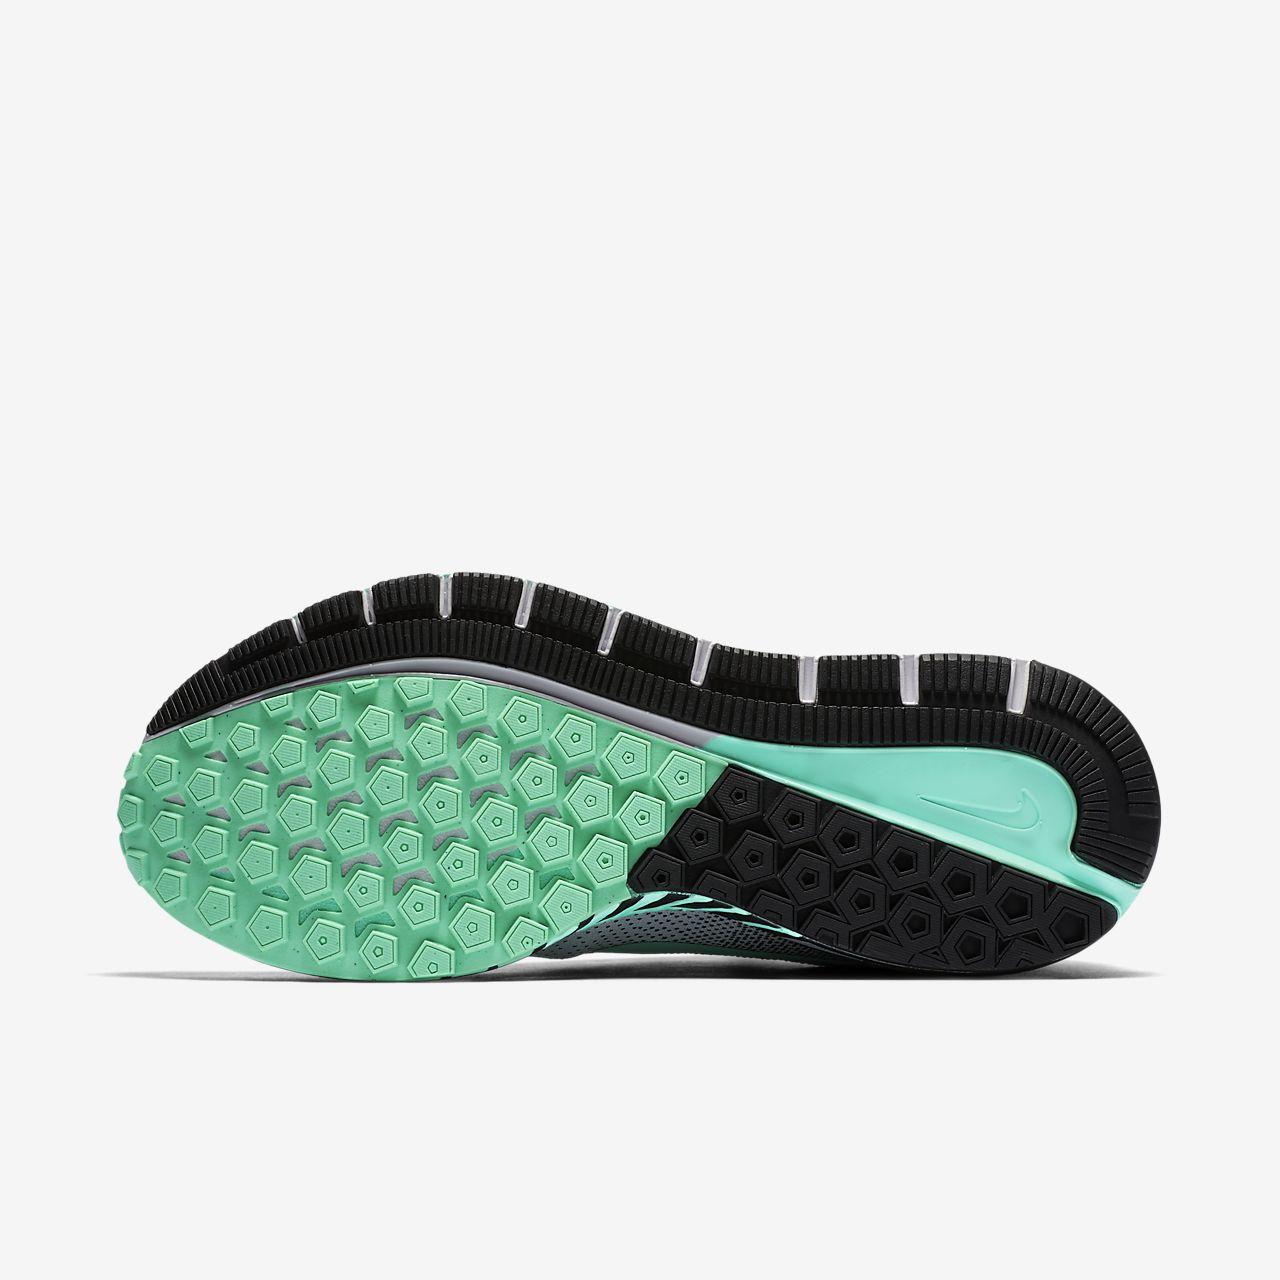 Air Structure Zoom 20 Solstice - Chaussures - Bas-tops Et Baskets Nike sJVVemQA